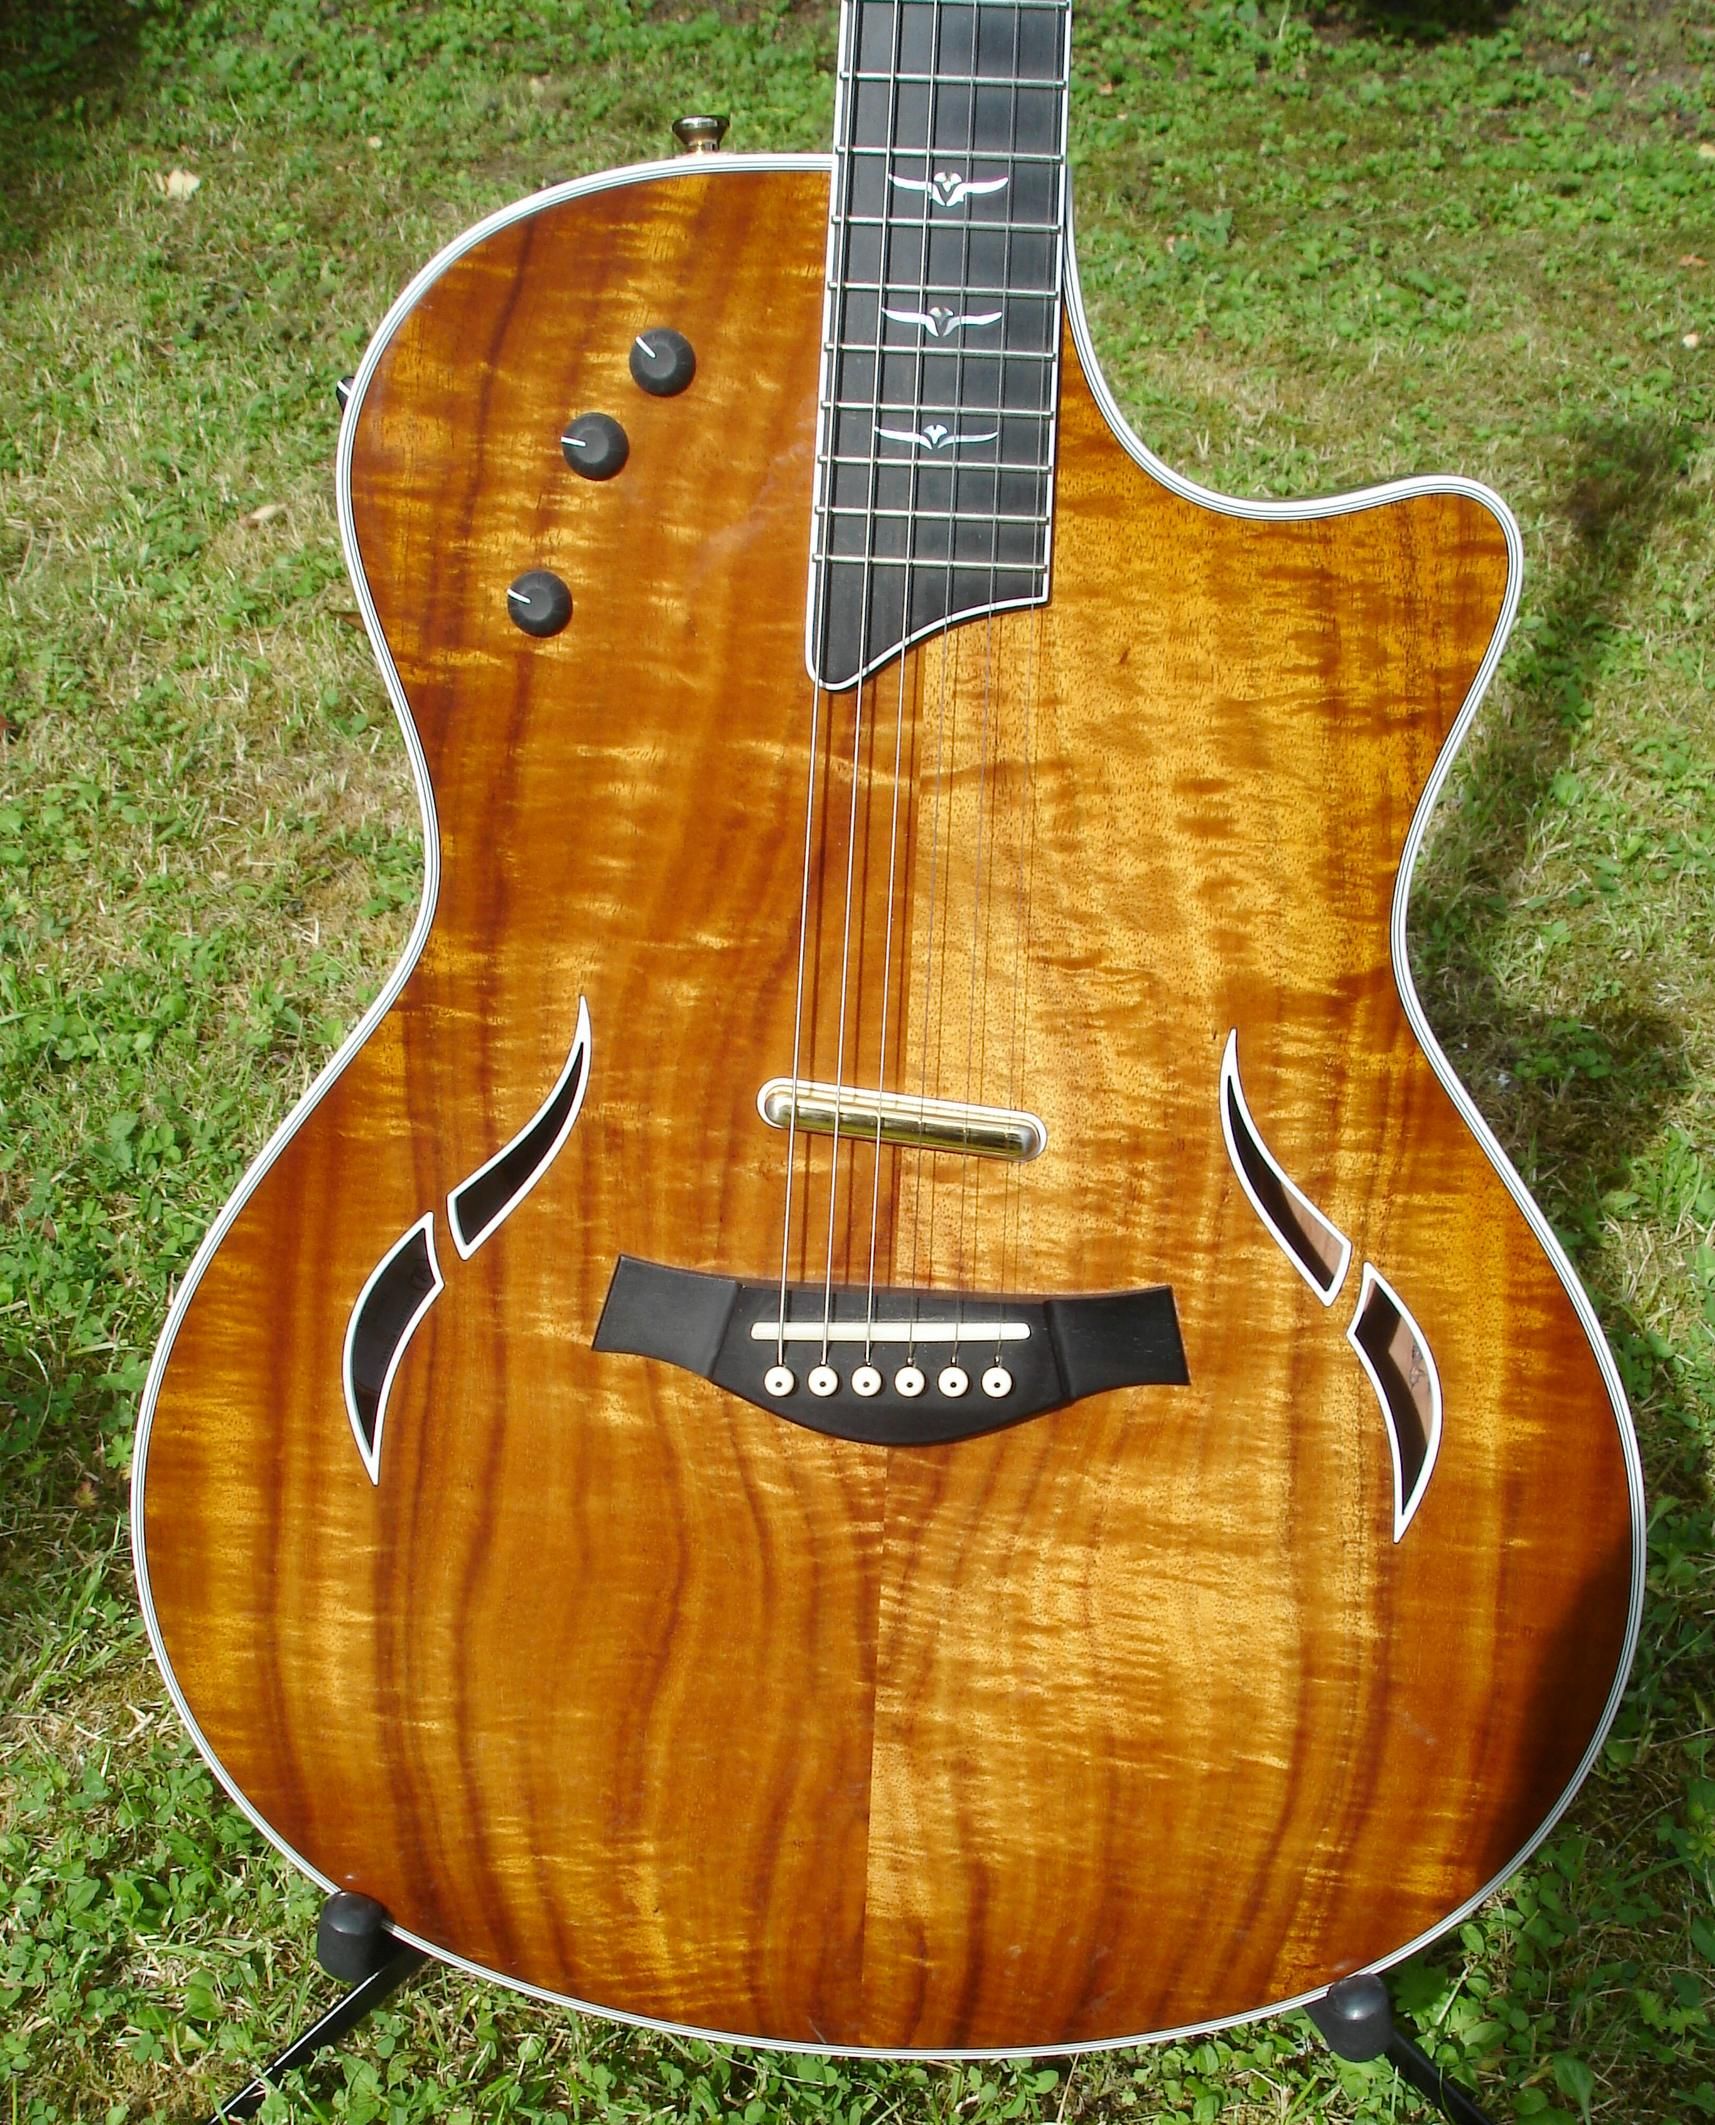 Stringkiller's Taylor Custom T5 Koa